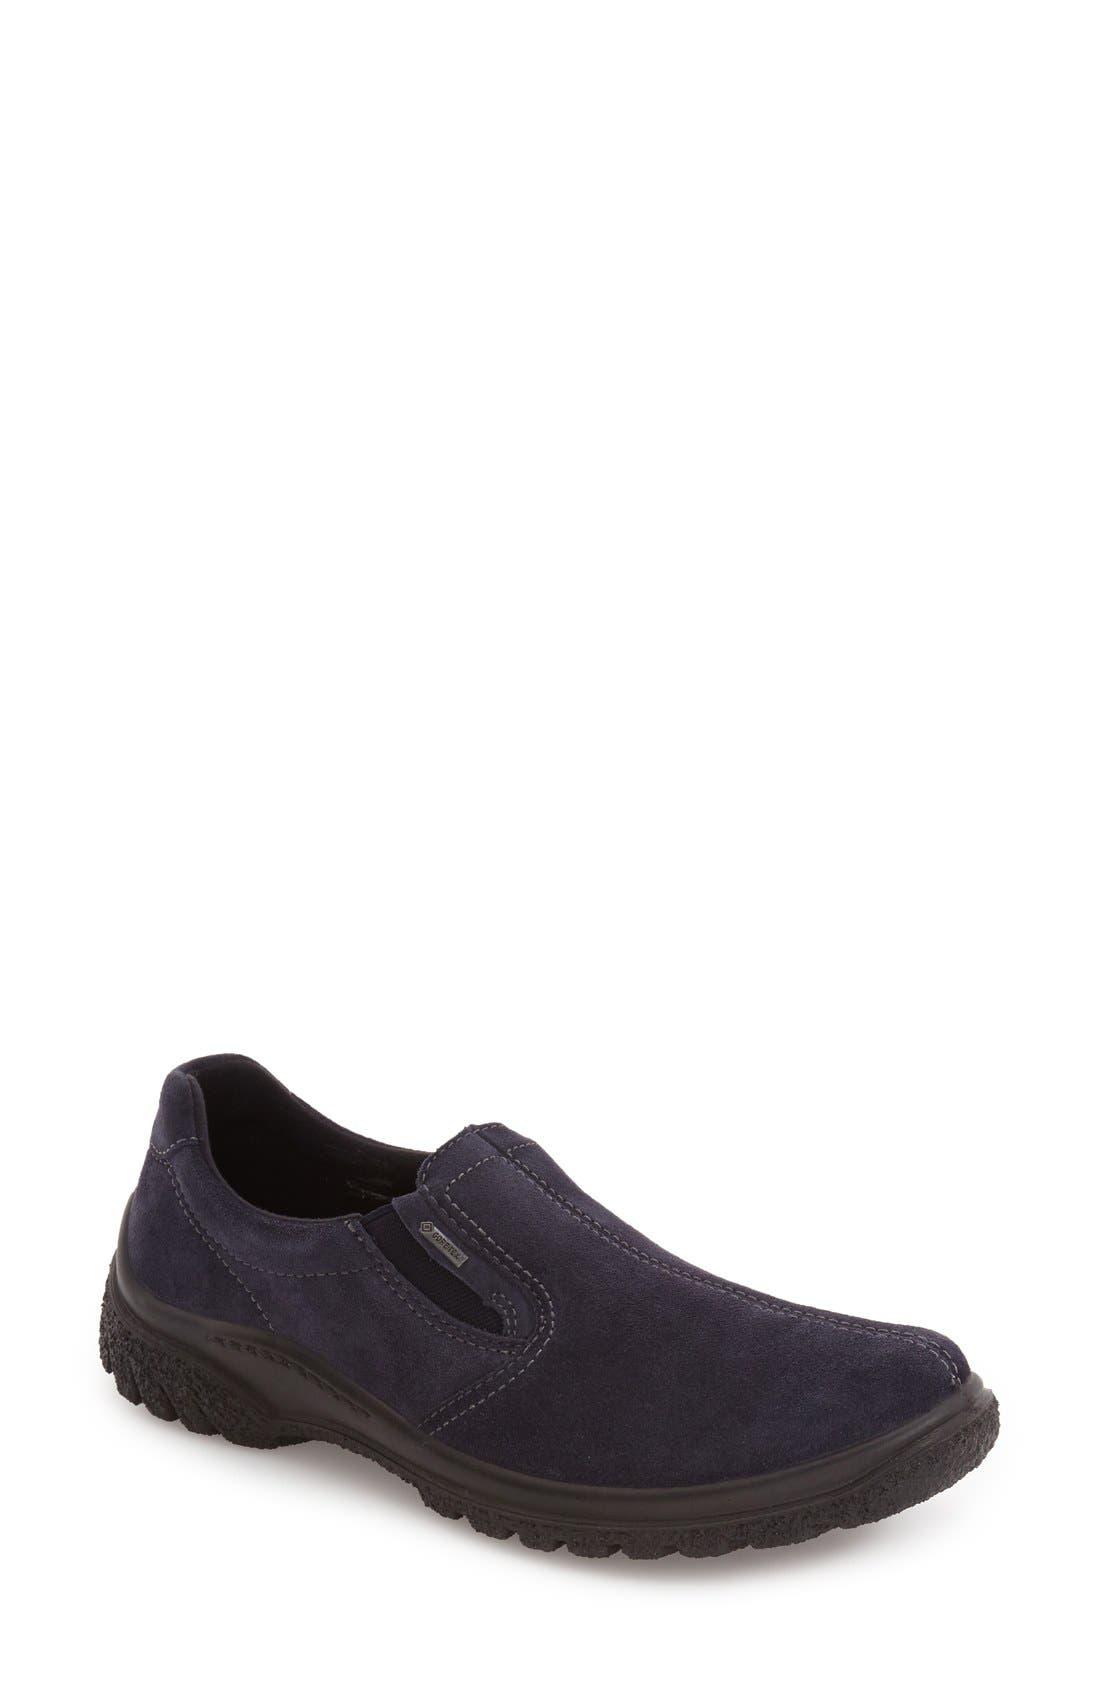 Parson Waterproof Gore-Tex<sup>®</sup> Slip-On Sneaker,                             Main thumbnail 1, color,                             NAVY SUEDE